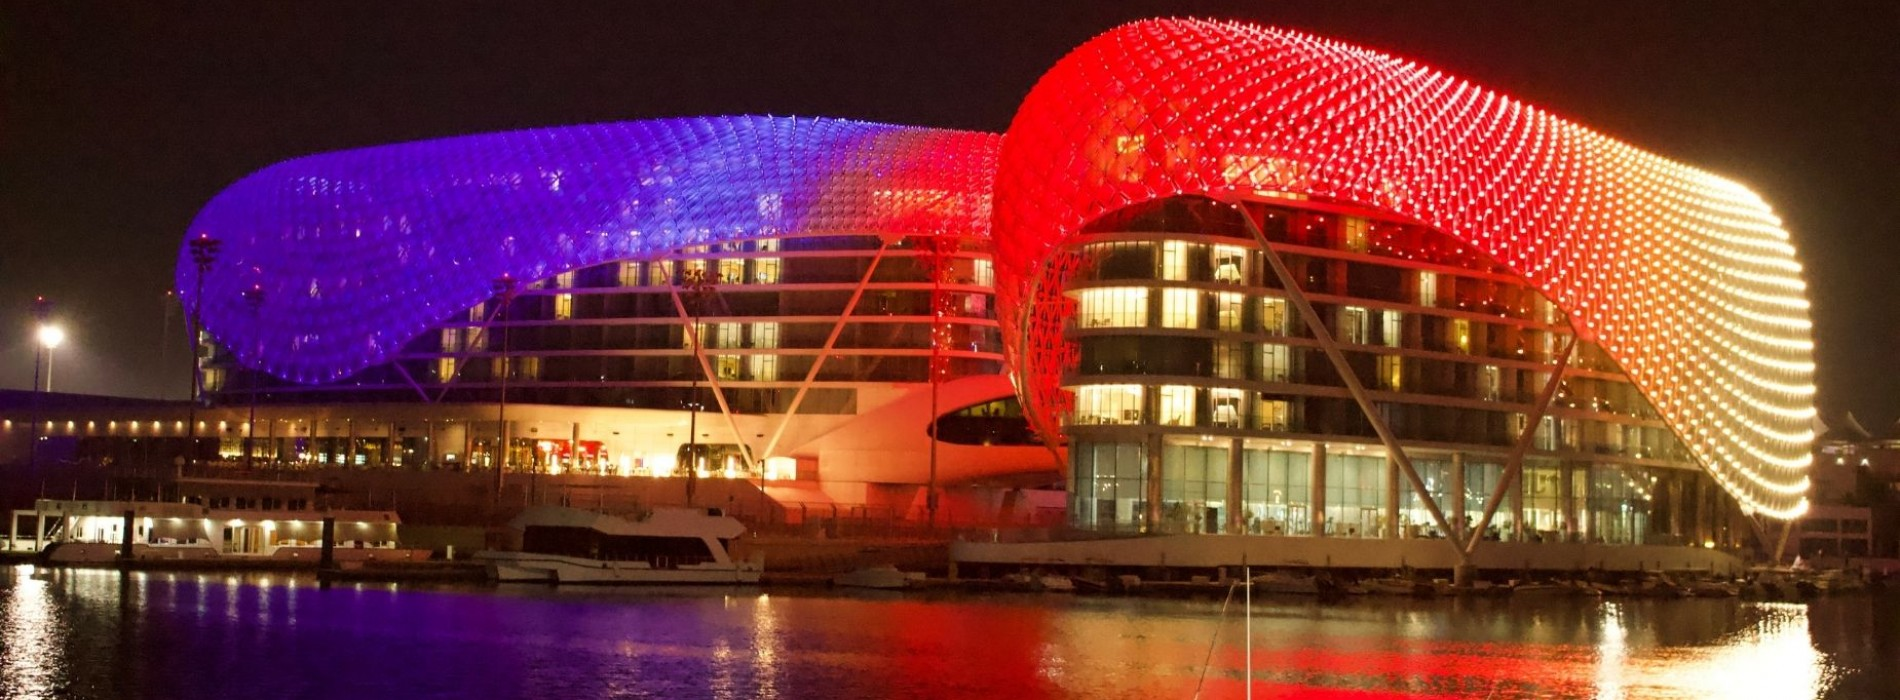 The Colors of Holi Soared across in Abu Dhabi's Yas Island